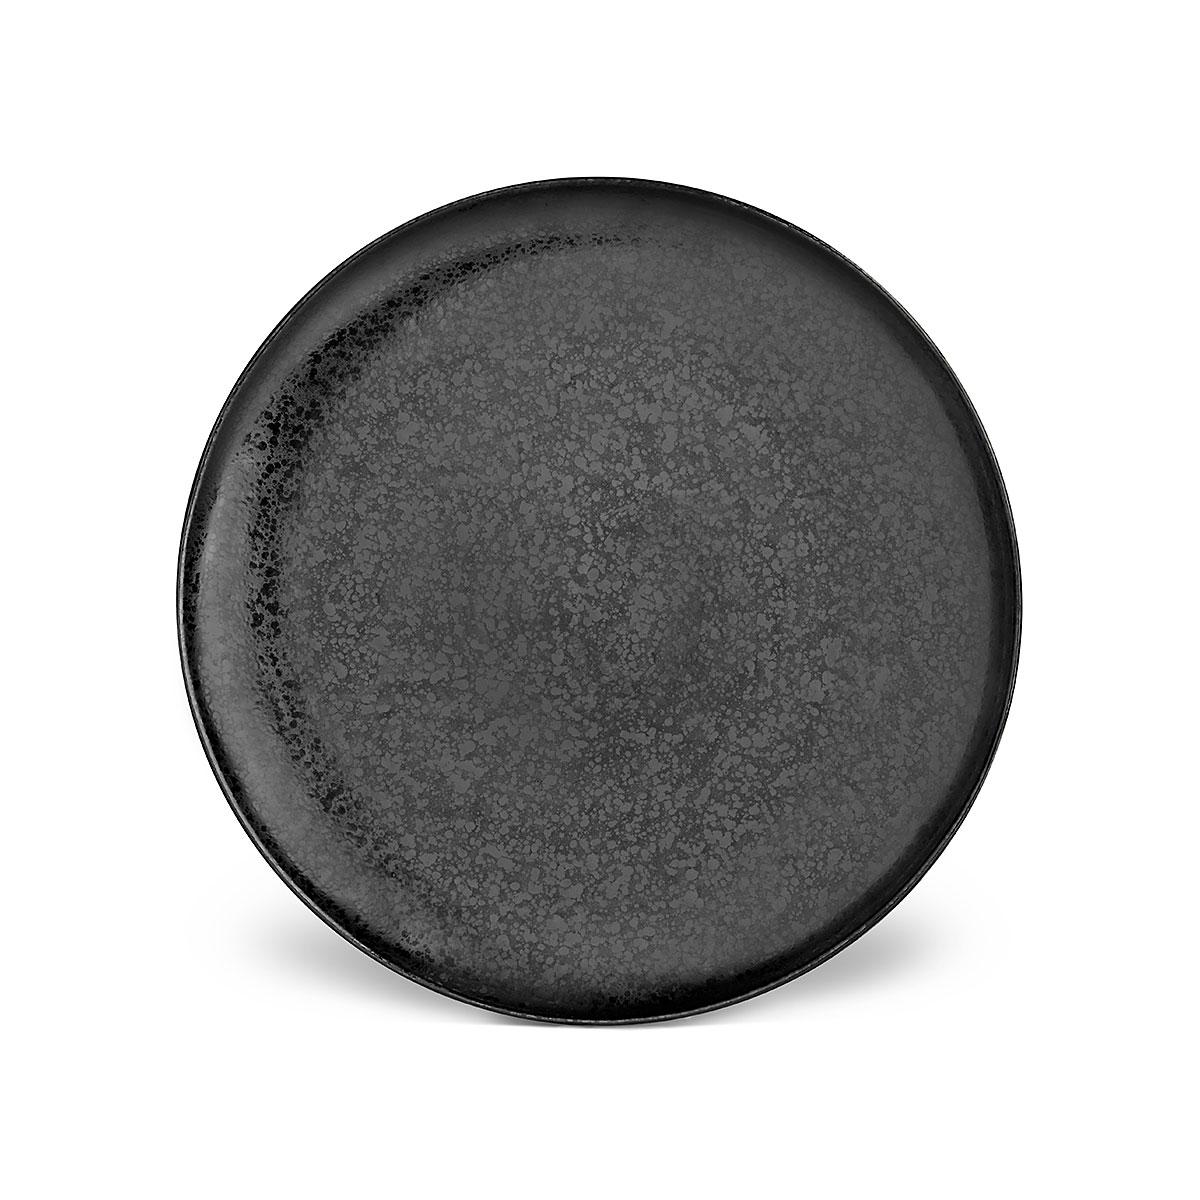 L'Objet I Alchimie Charger Black